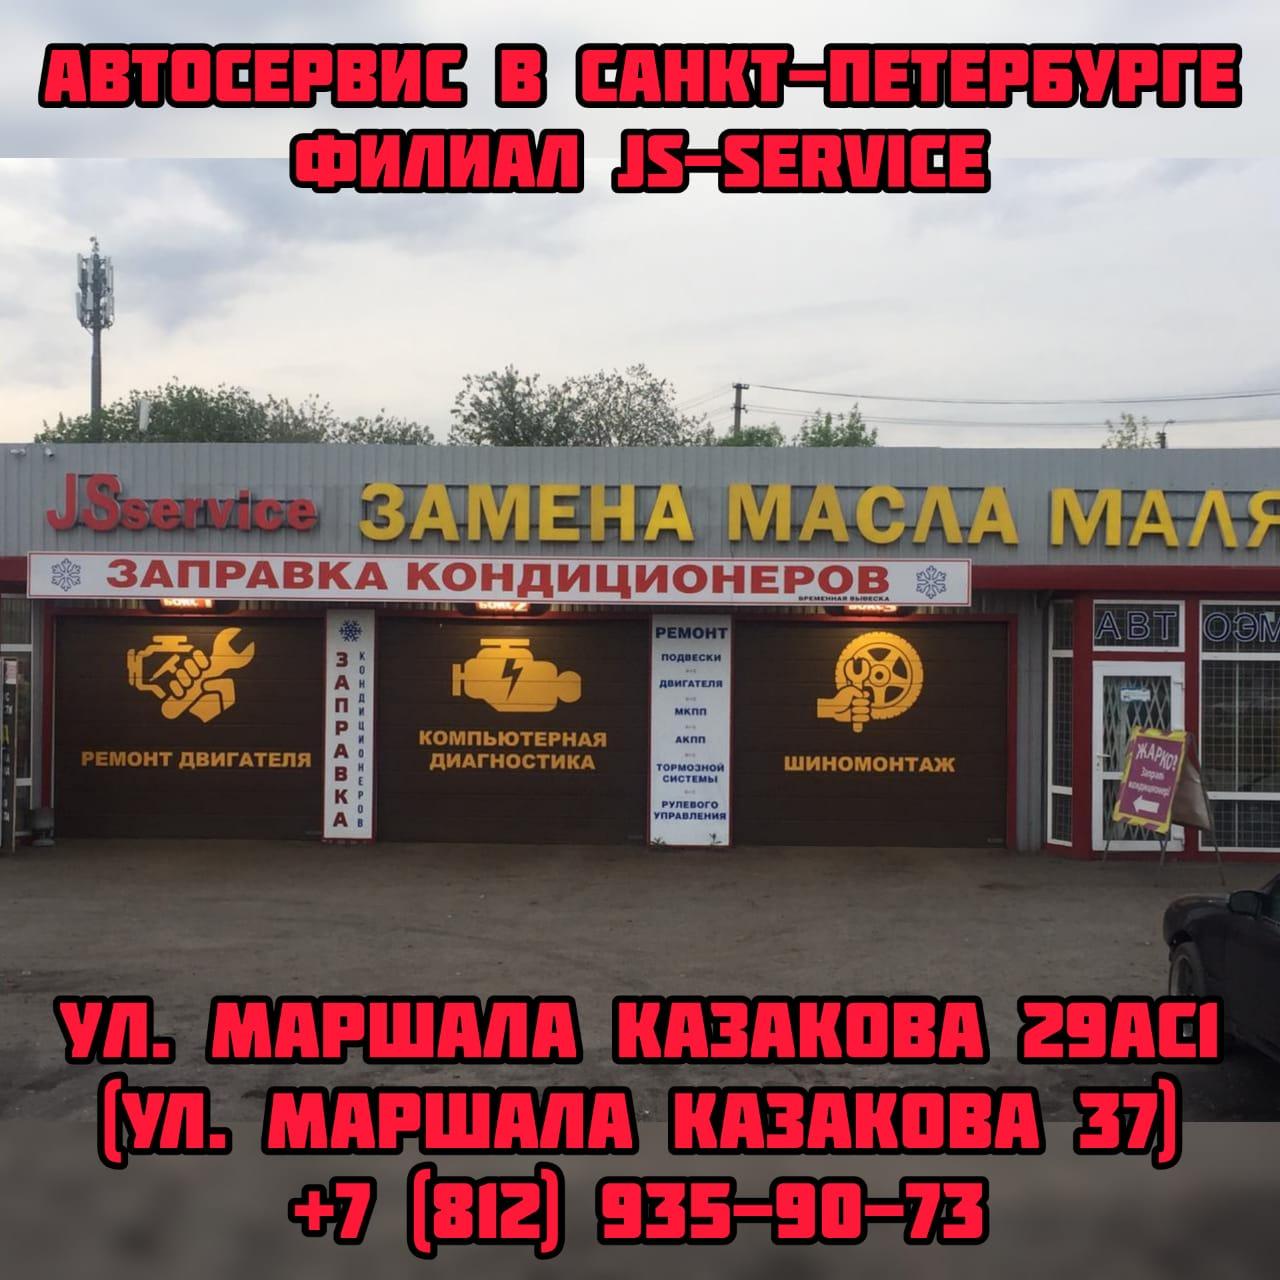 Автосервис в СПб ремонт подвески двигателя замена масла Кировский район Маршала Казакова JS-Service